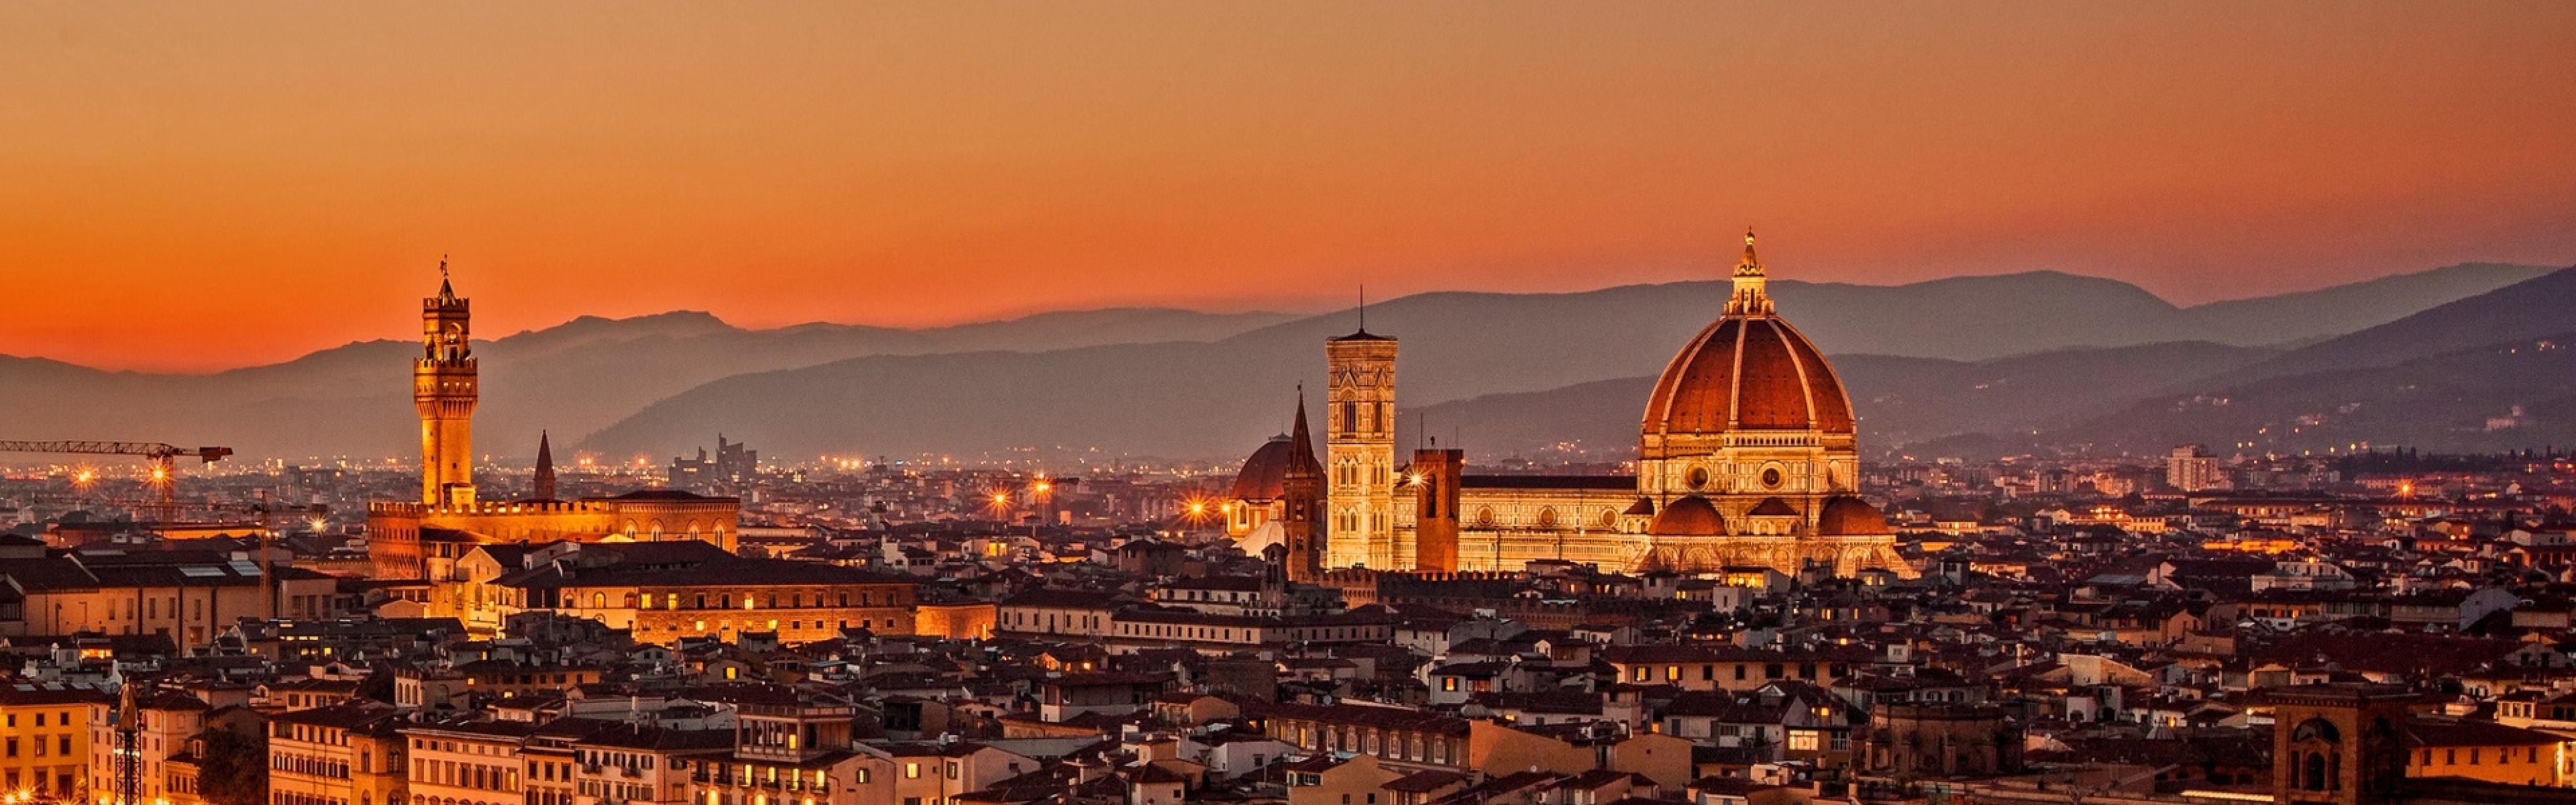 Florence HD pics